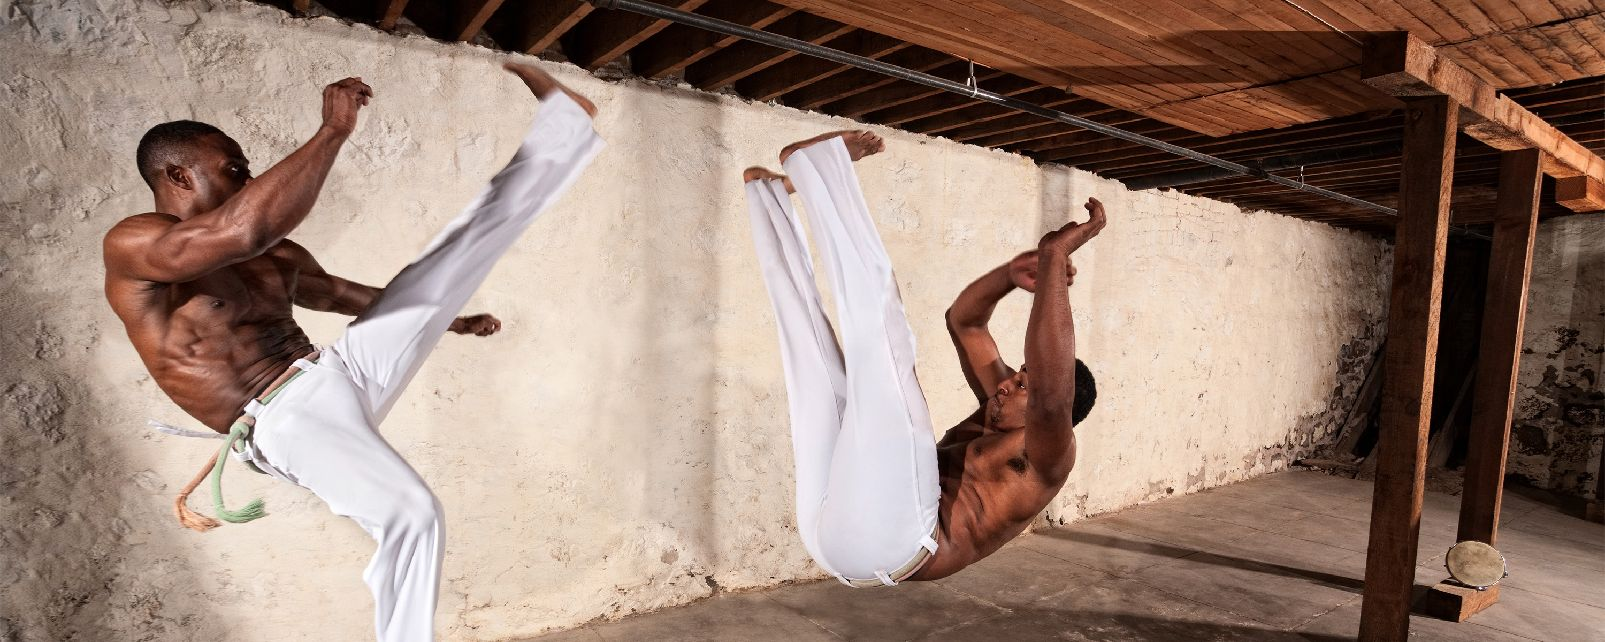 La capoeira , Brasile